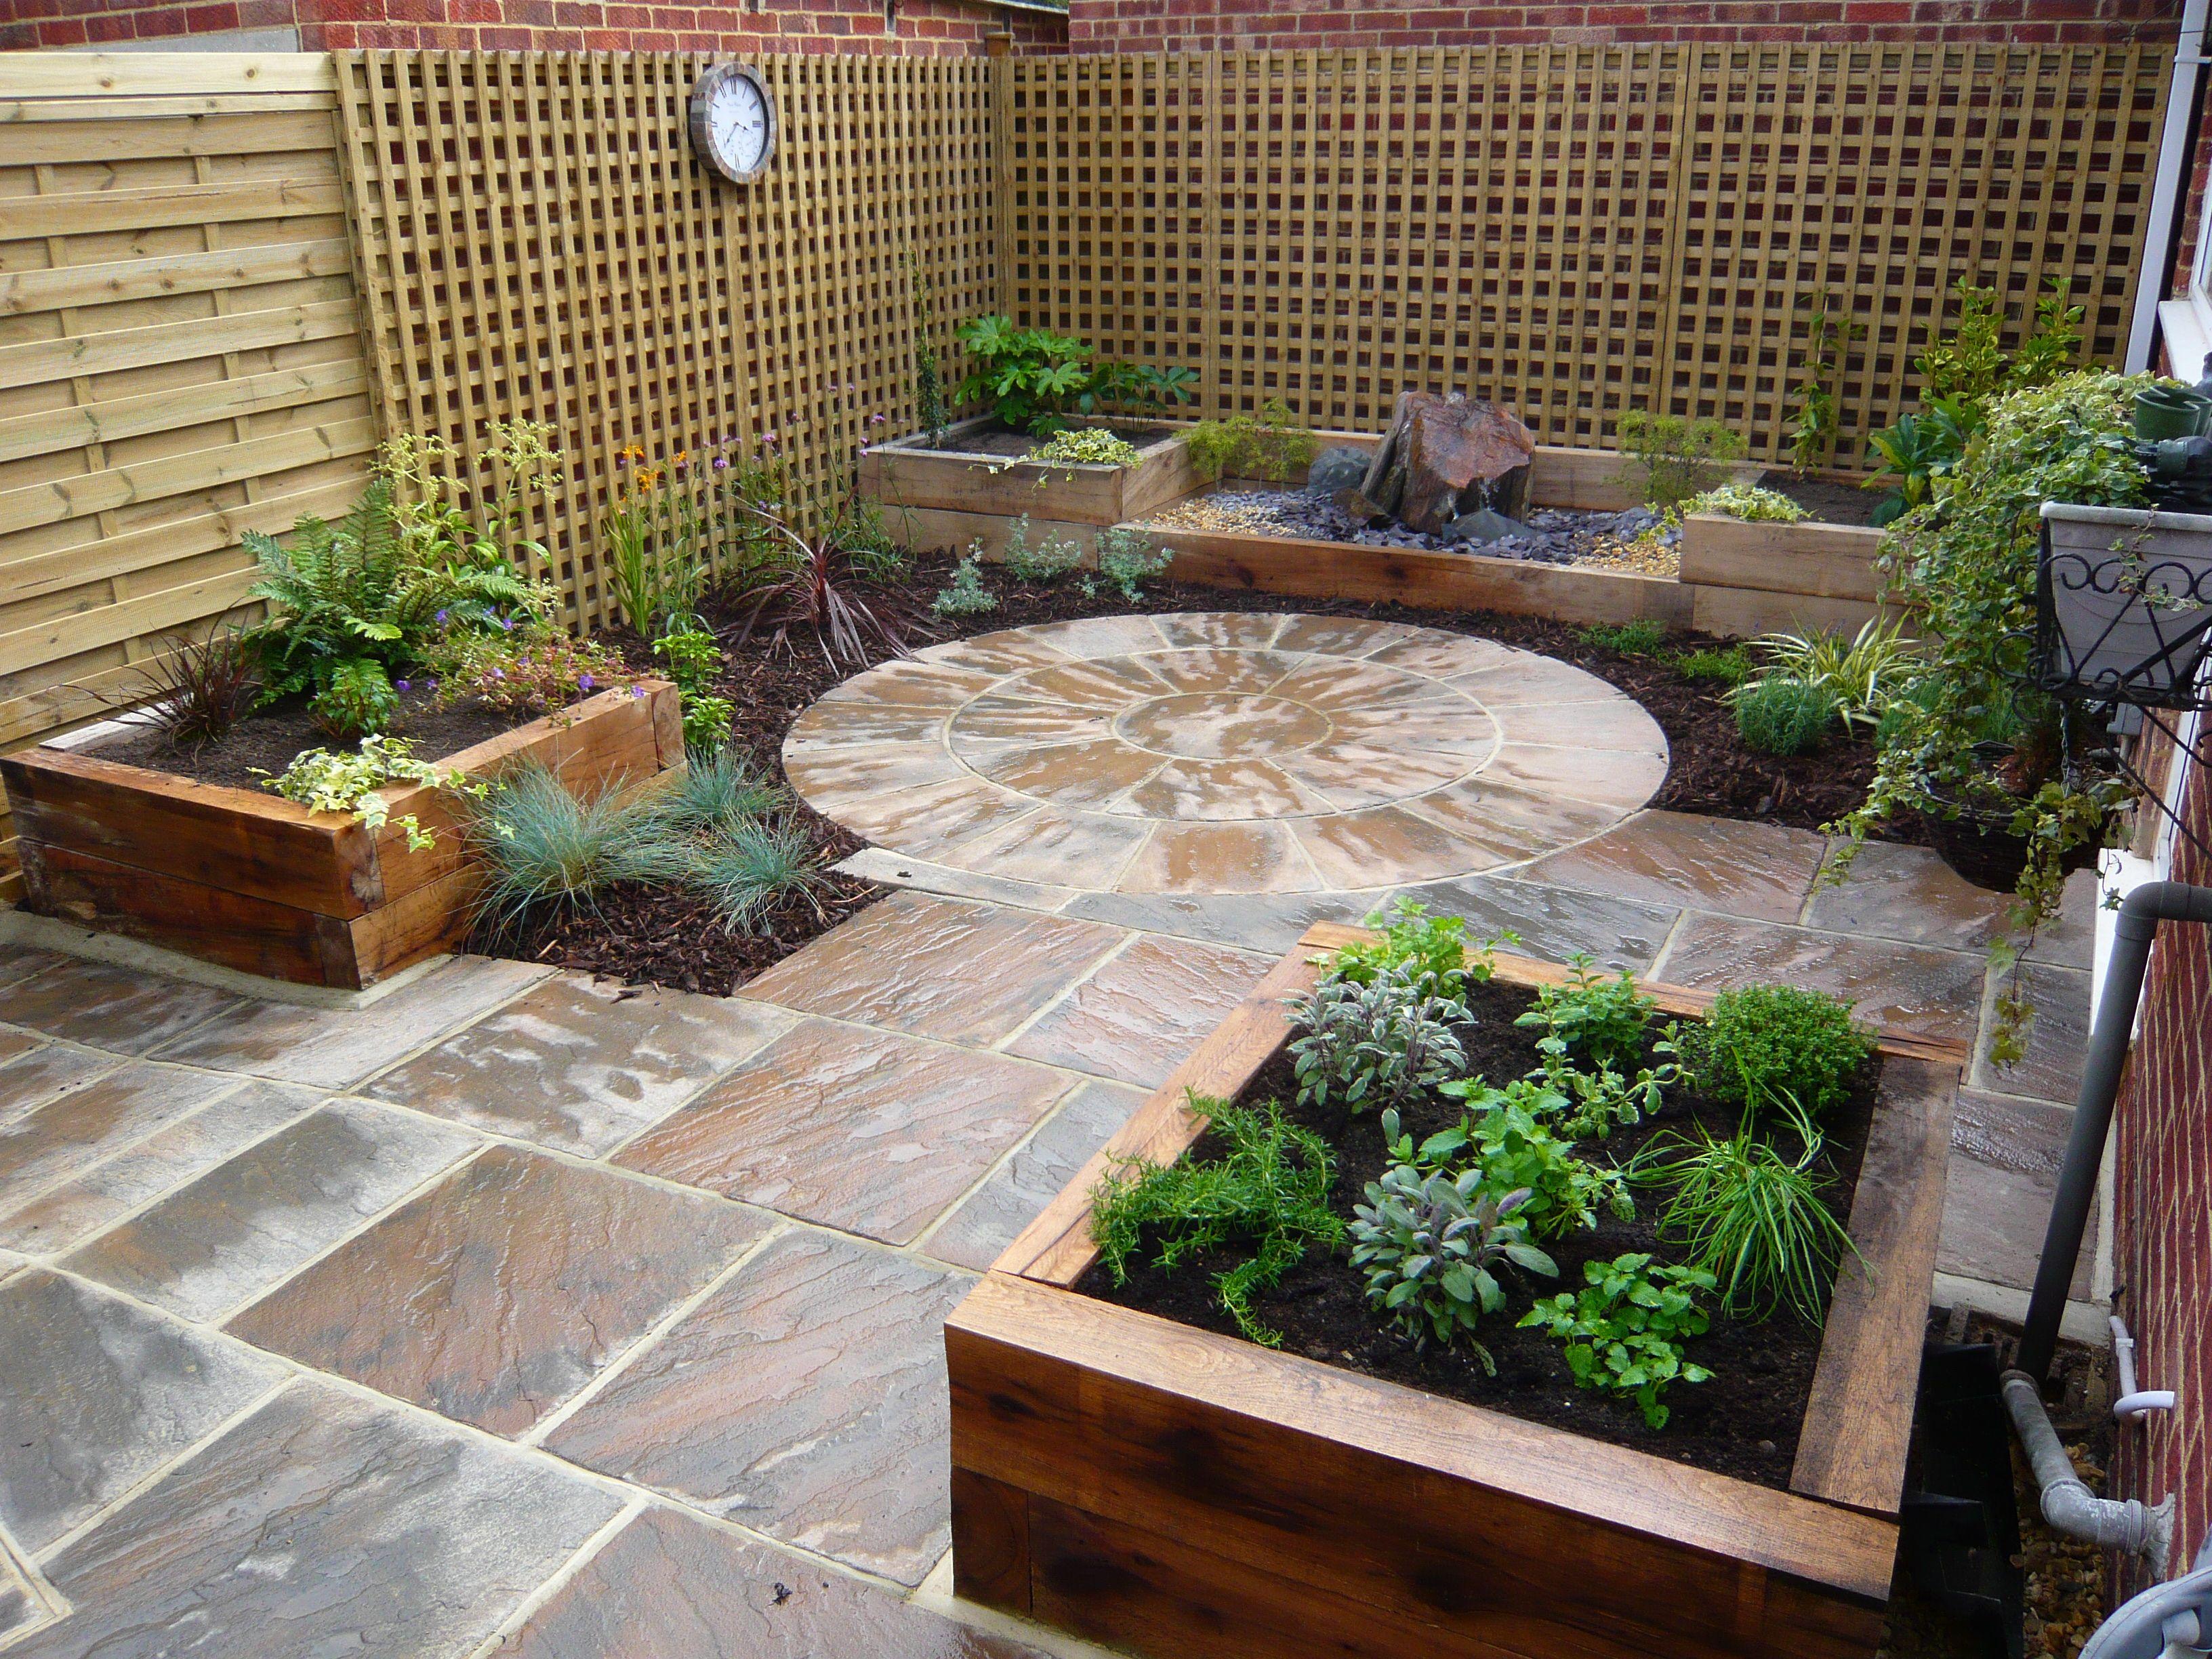 Kerensa Gardens | Garden Design, Garden Design Layout, Low Maintenance Garden